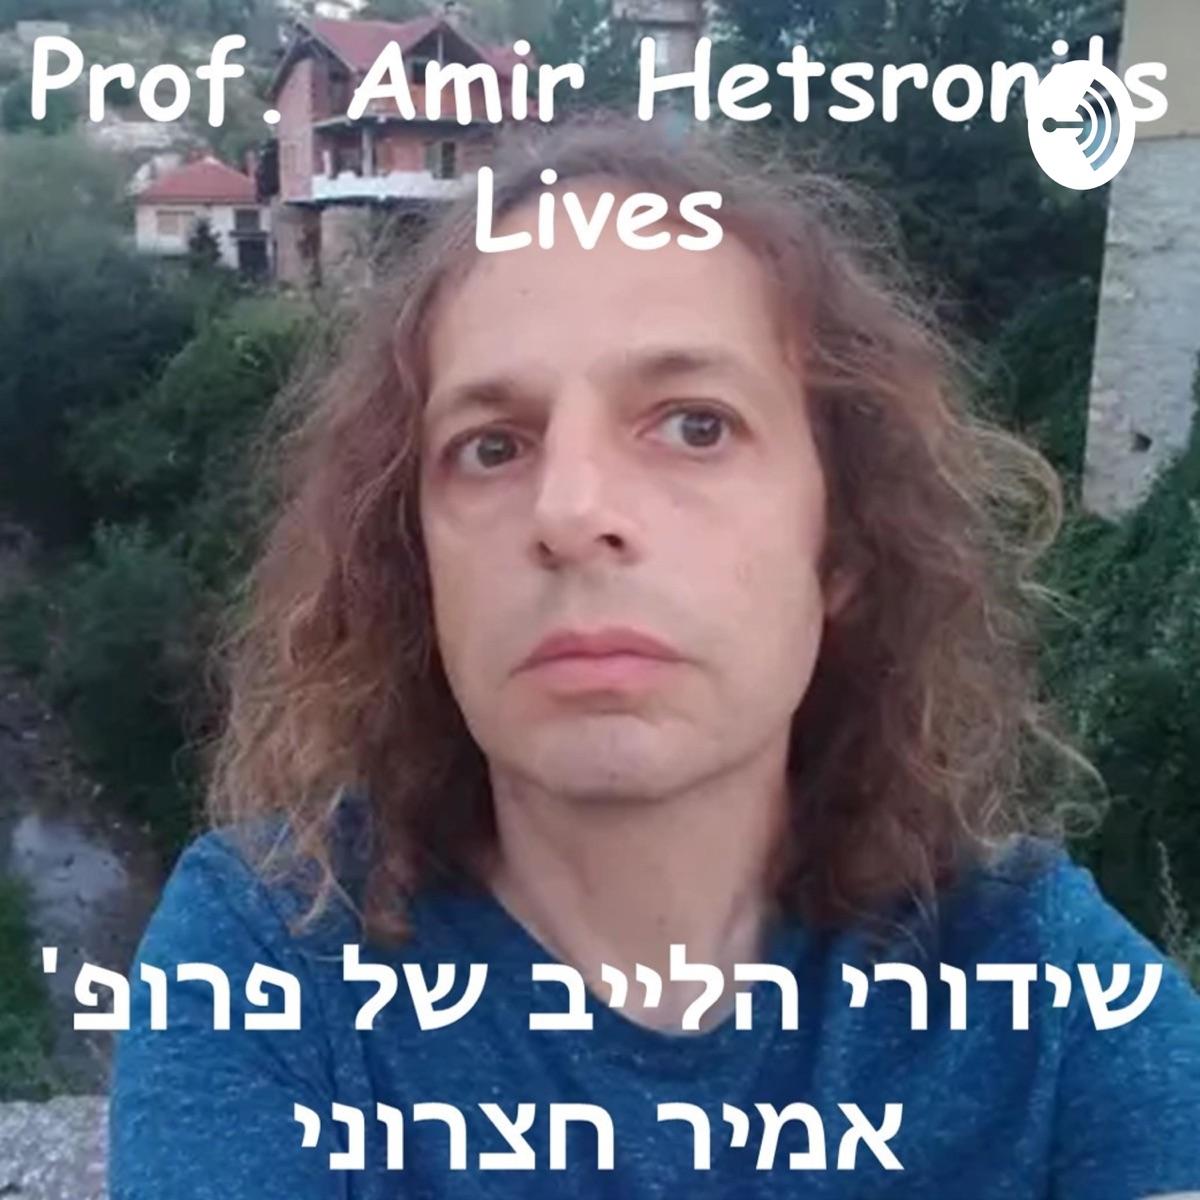 Prof. Amir Hetsroni's Lives | שידורי הלייב של פרופ' אמיר חצרוני